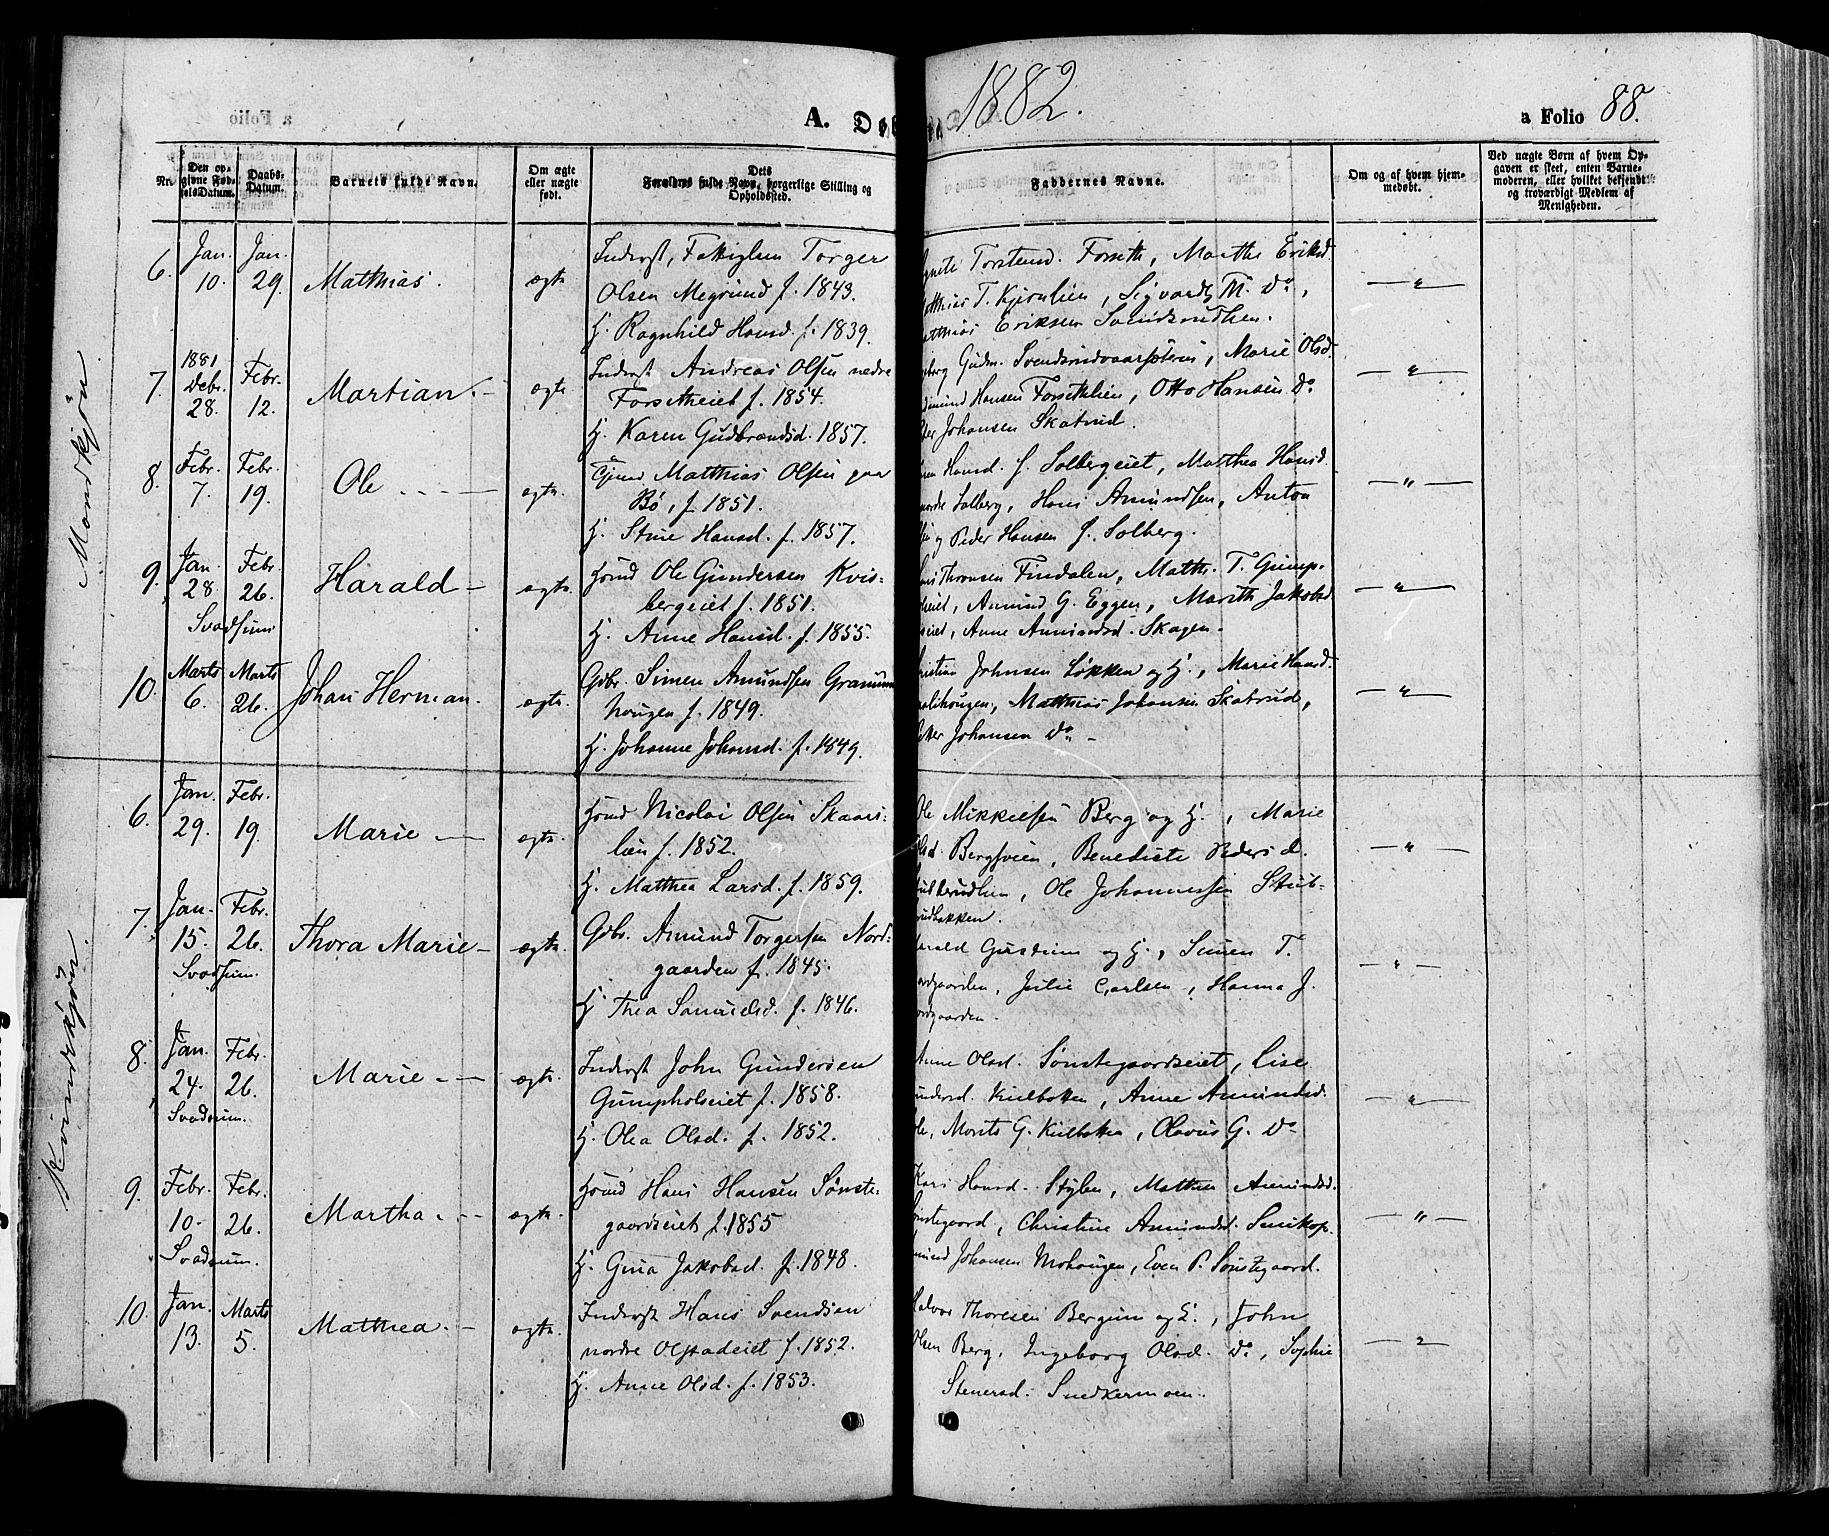 SAH, Gausdal prestekontor, Ministerialbok nr. 10, 1867-1886, s. 88